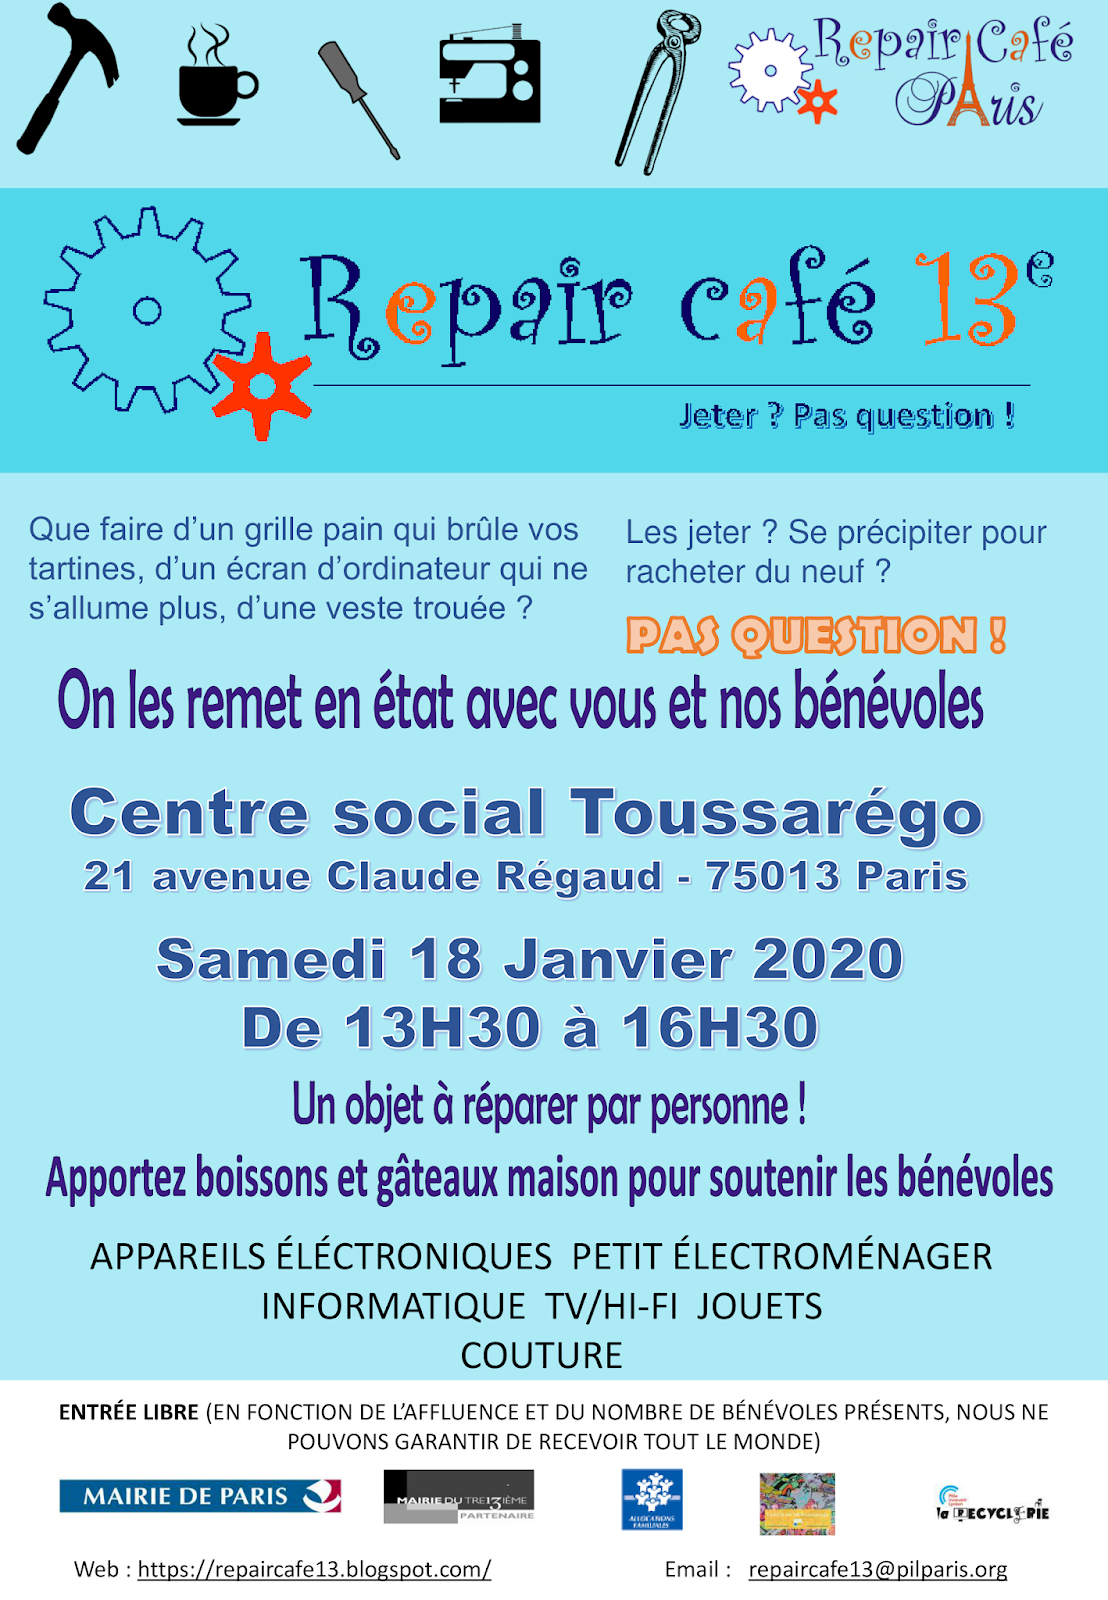 Repair Café Paris Calendrier 2022 Repair café Paris 13ème TOUSSAREGO